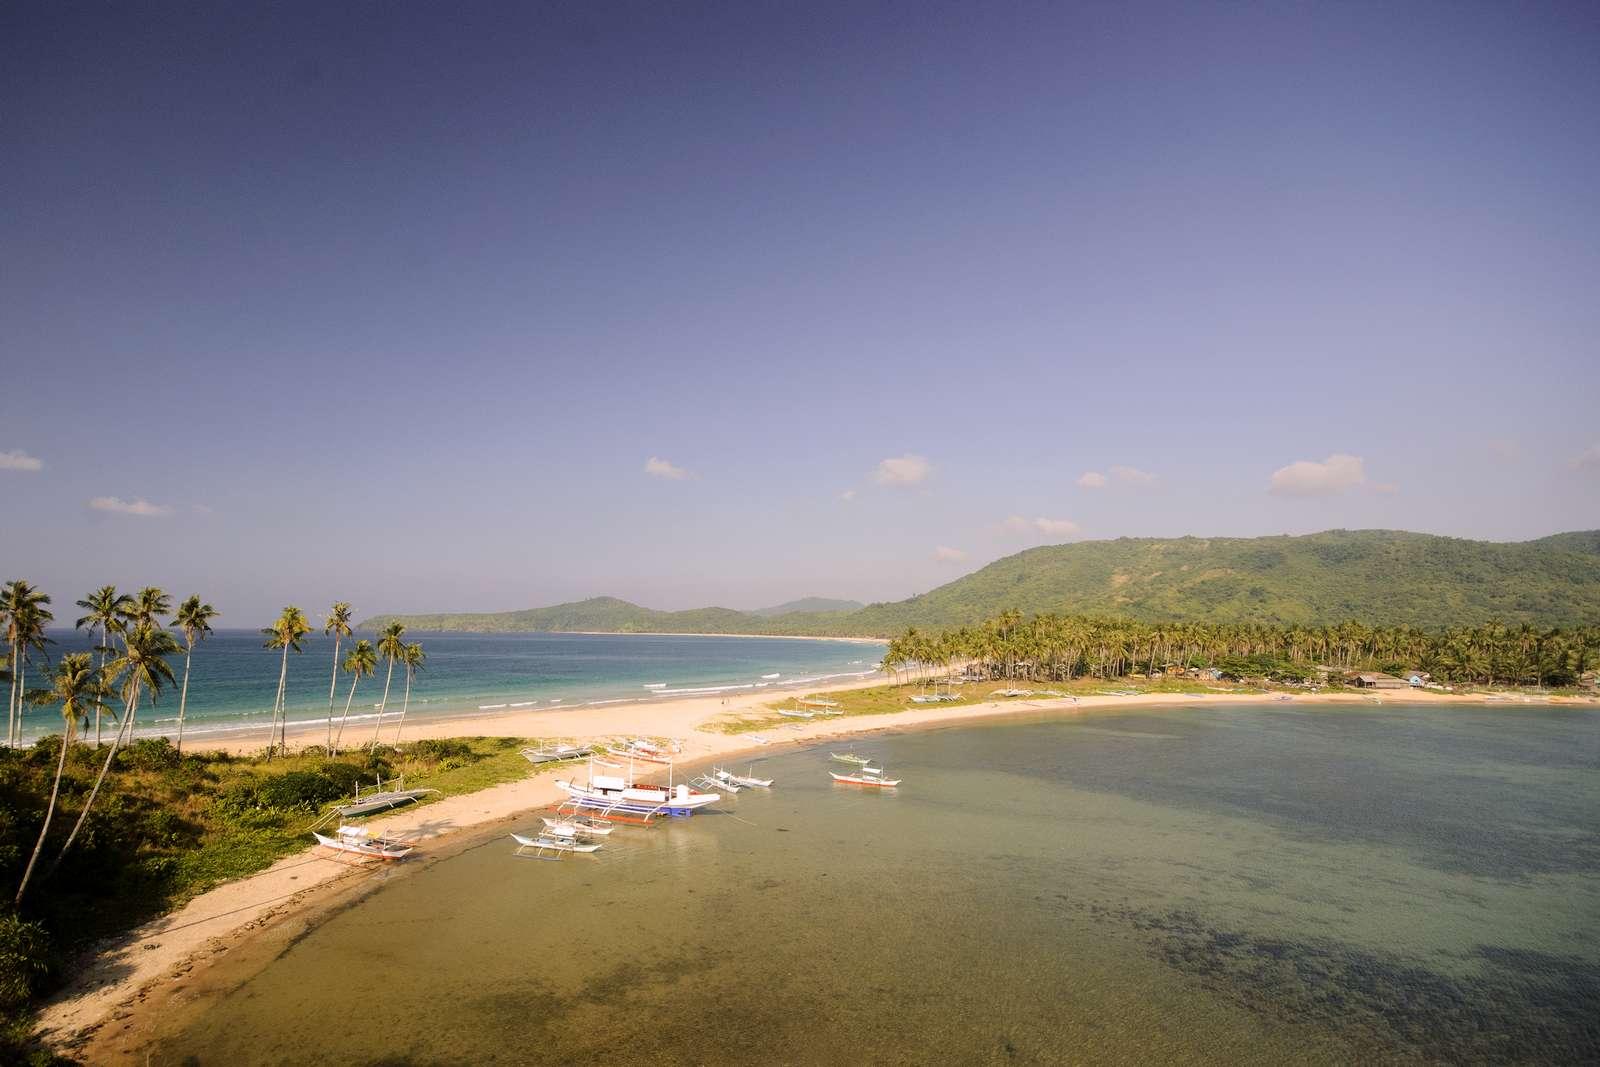 Calitang Beach, the other side of Nacpan Beach, El Nido